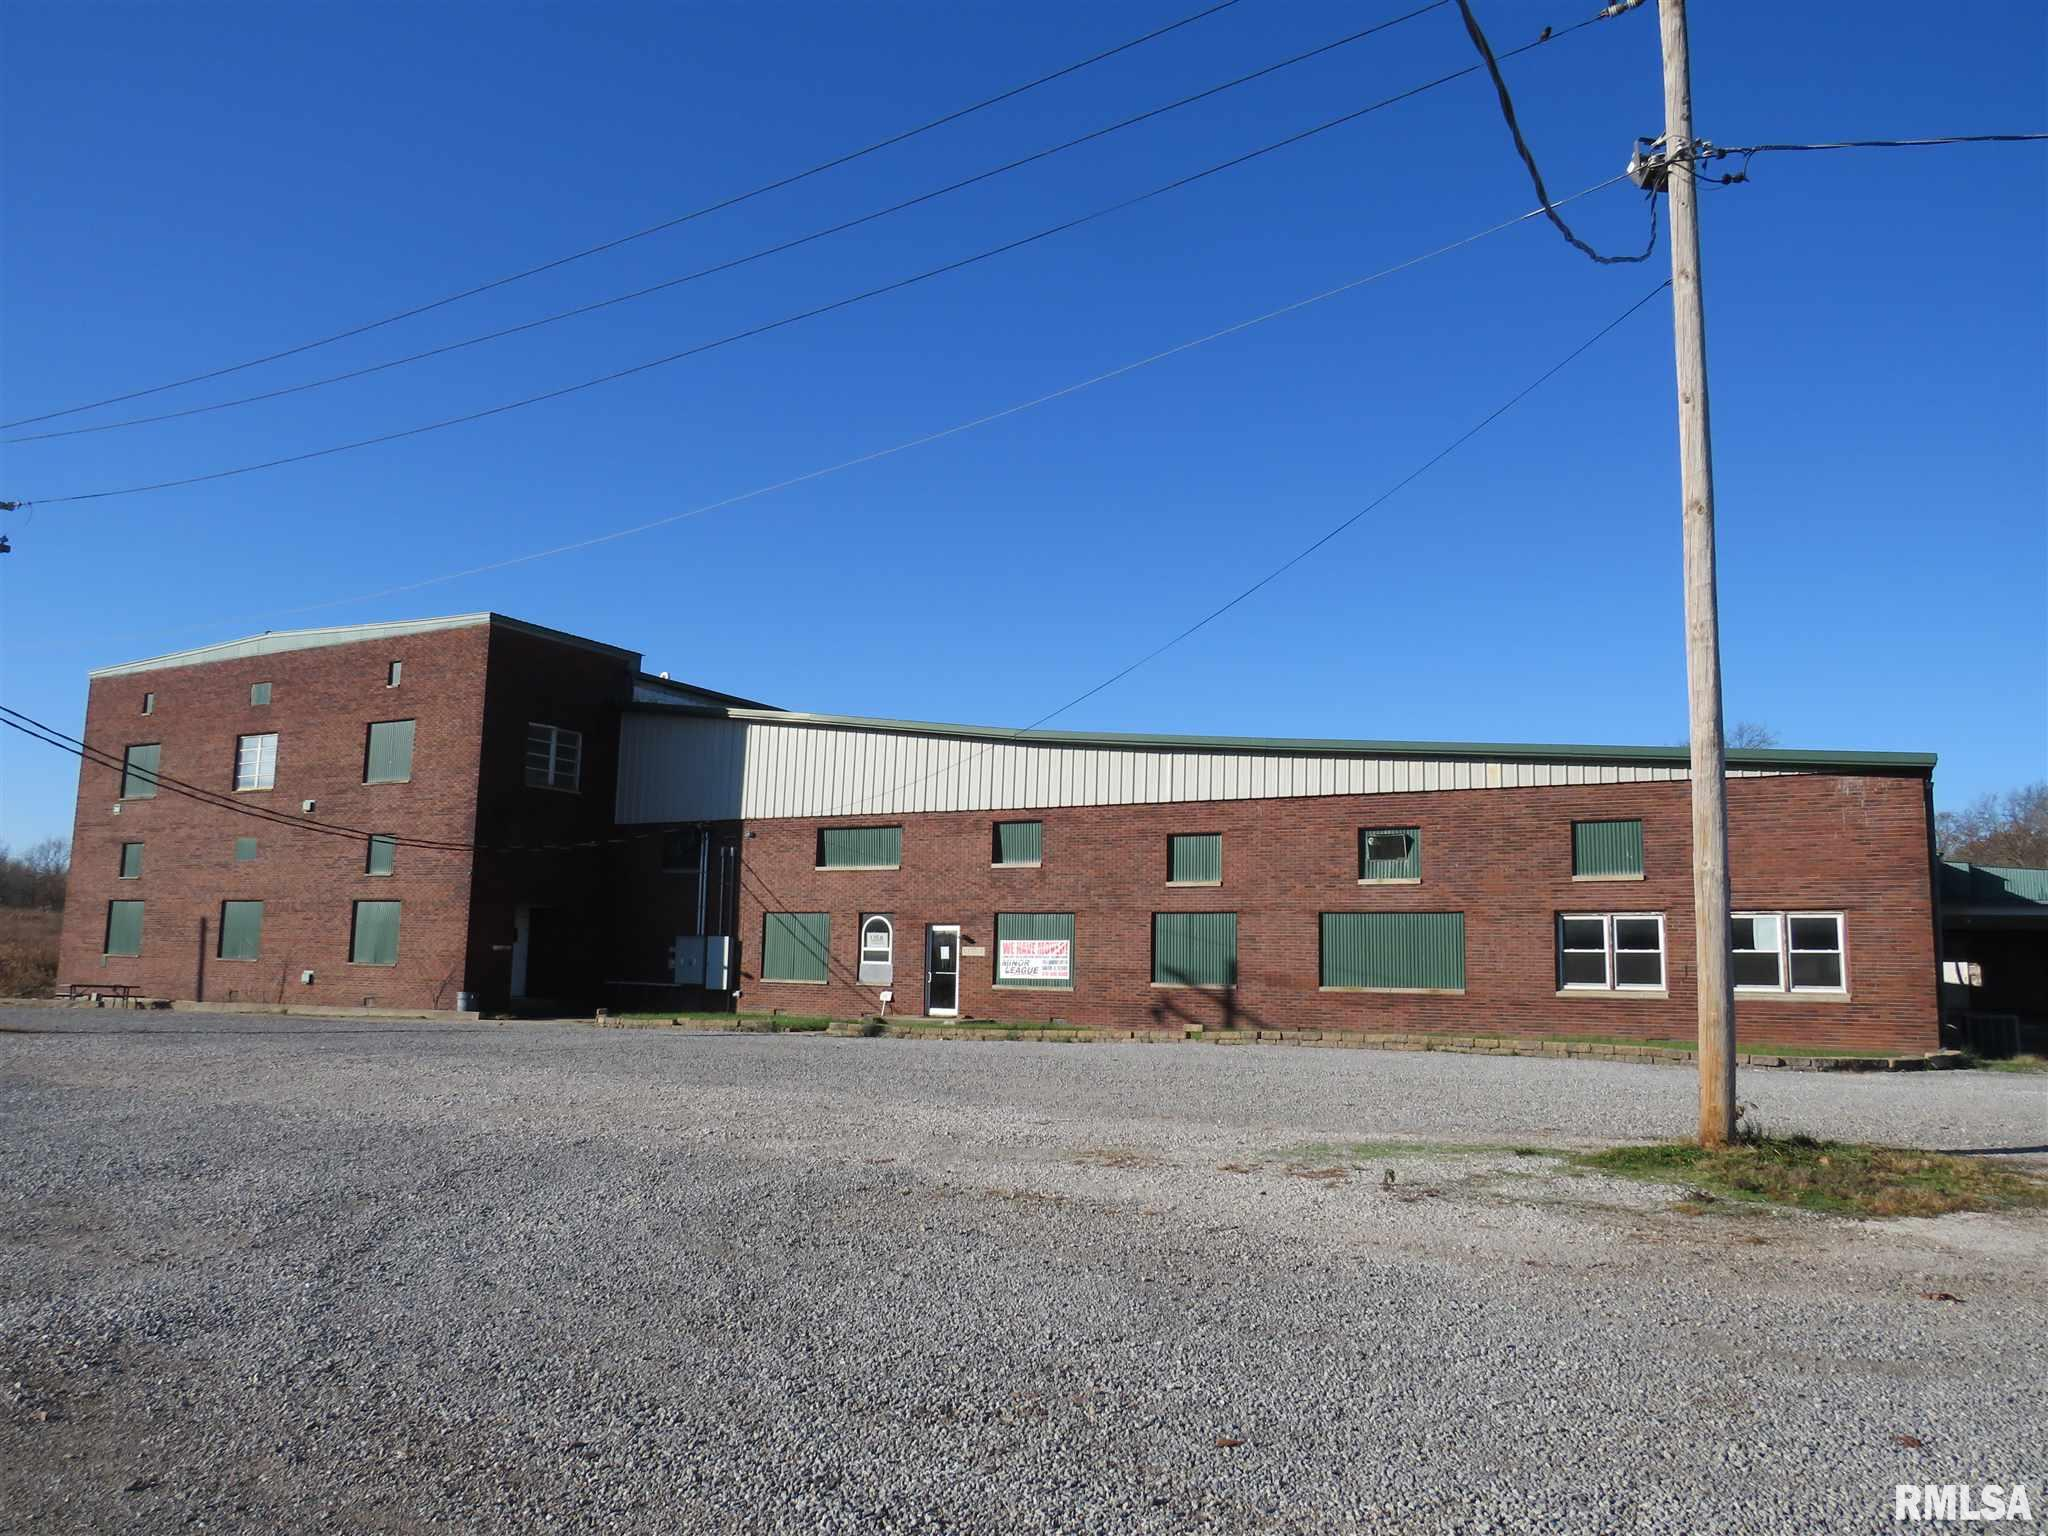 905 E MAIN Property Photo - Salem, IL real estate listing